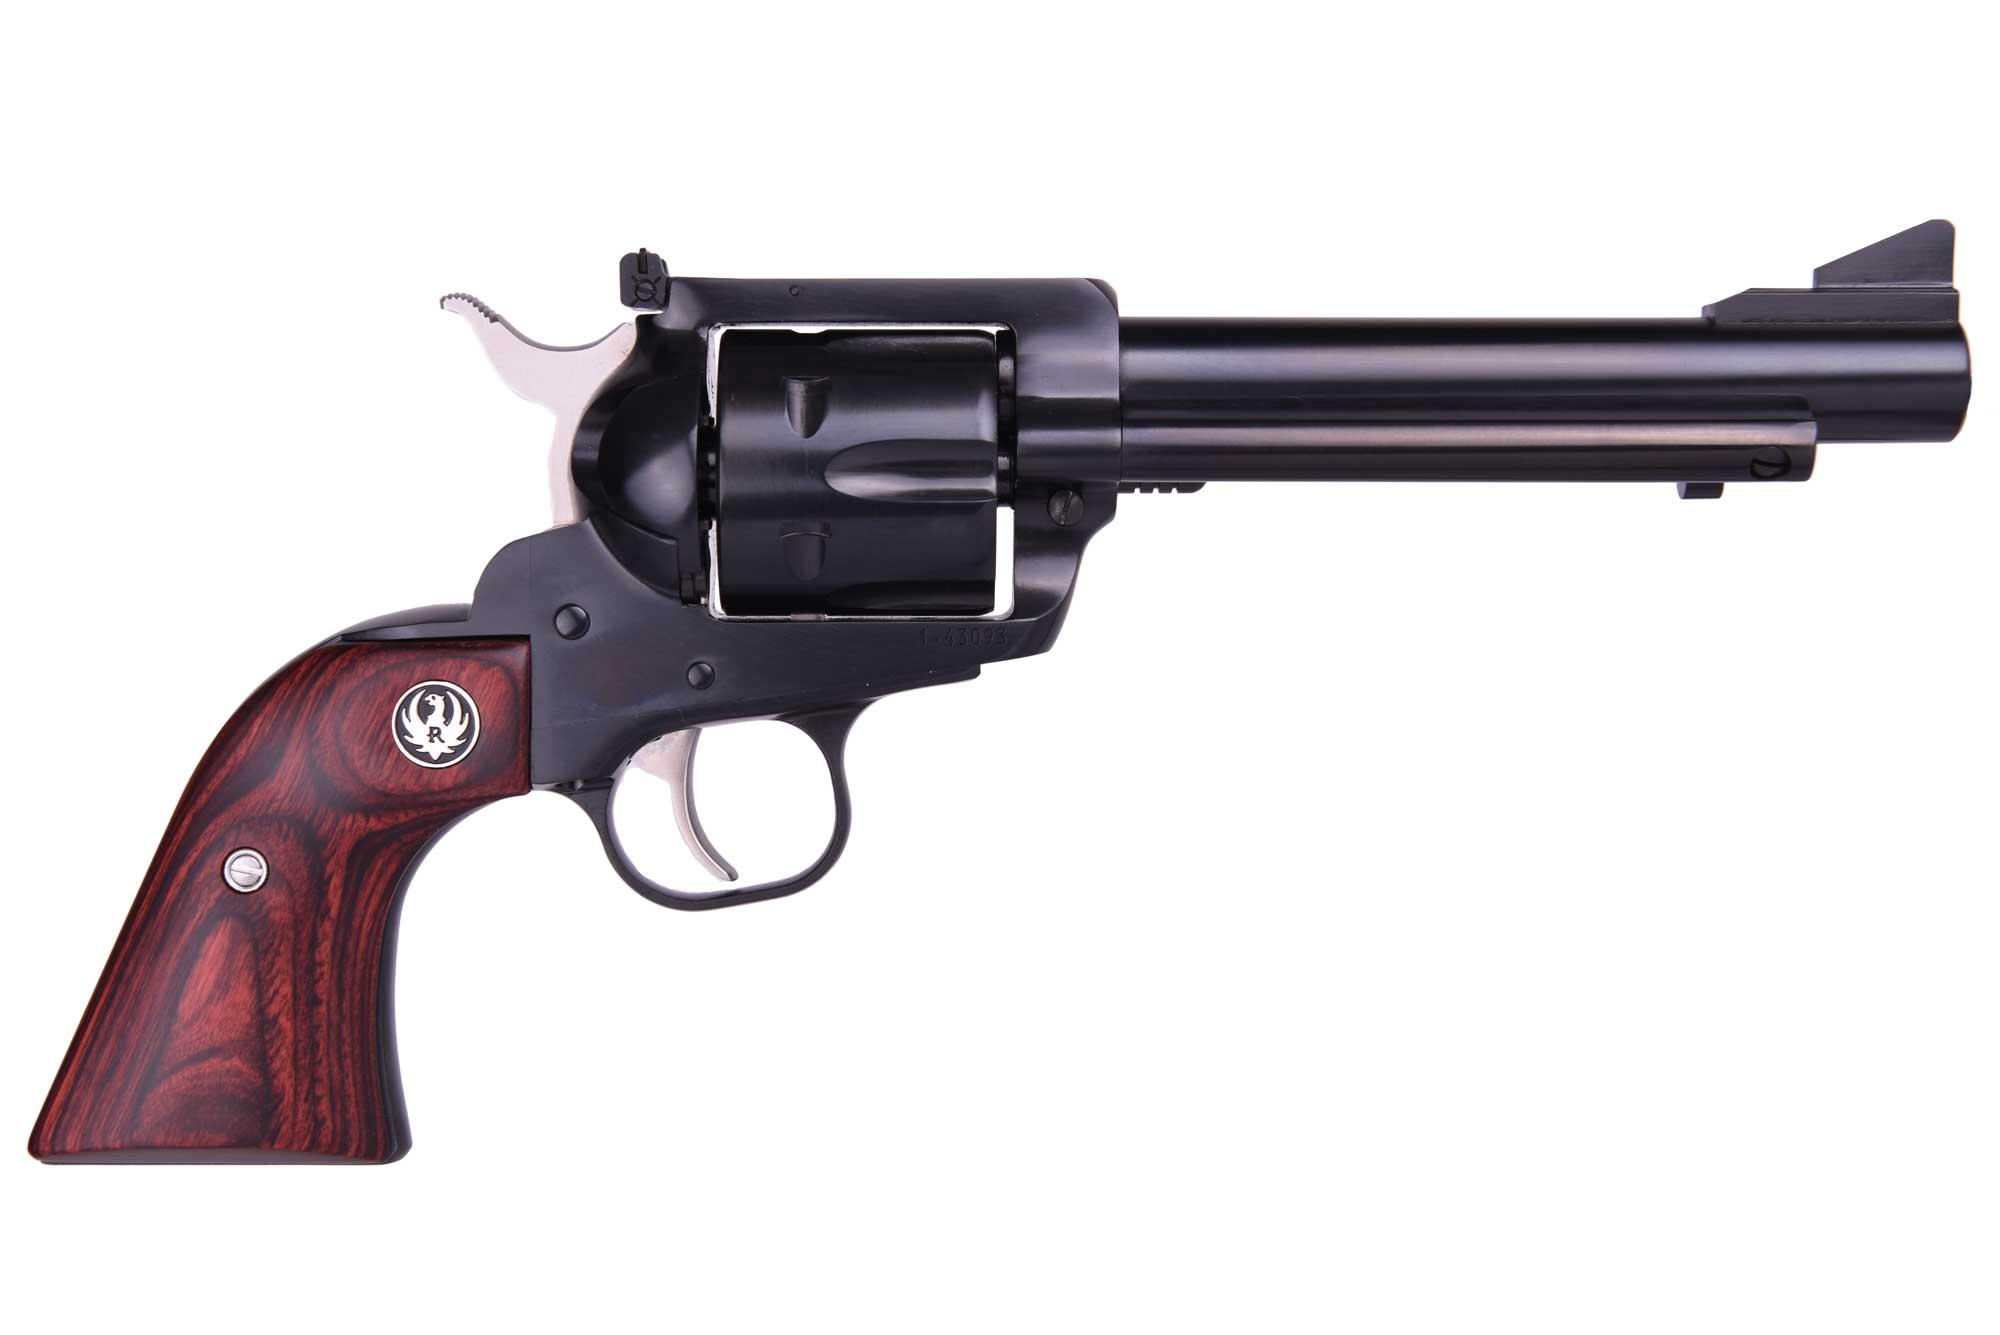 Ruger Blackhawk Flattop 357 Magnum | 9mm